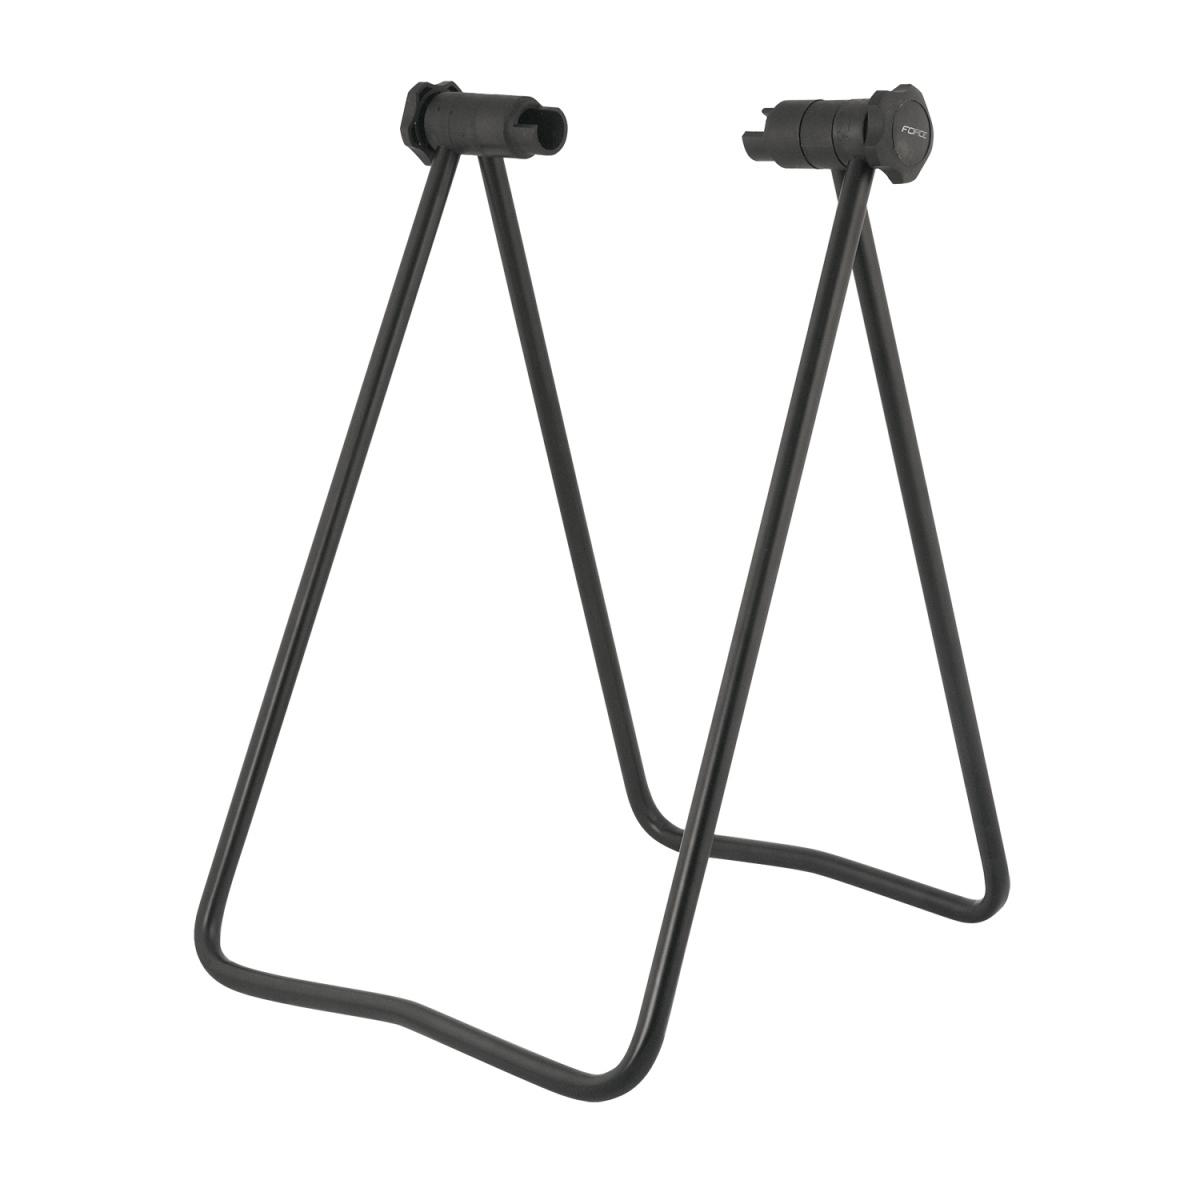 Force Cykelstativ for bagstel QR 20-29